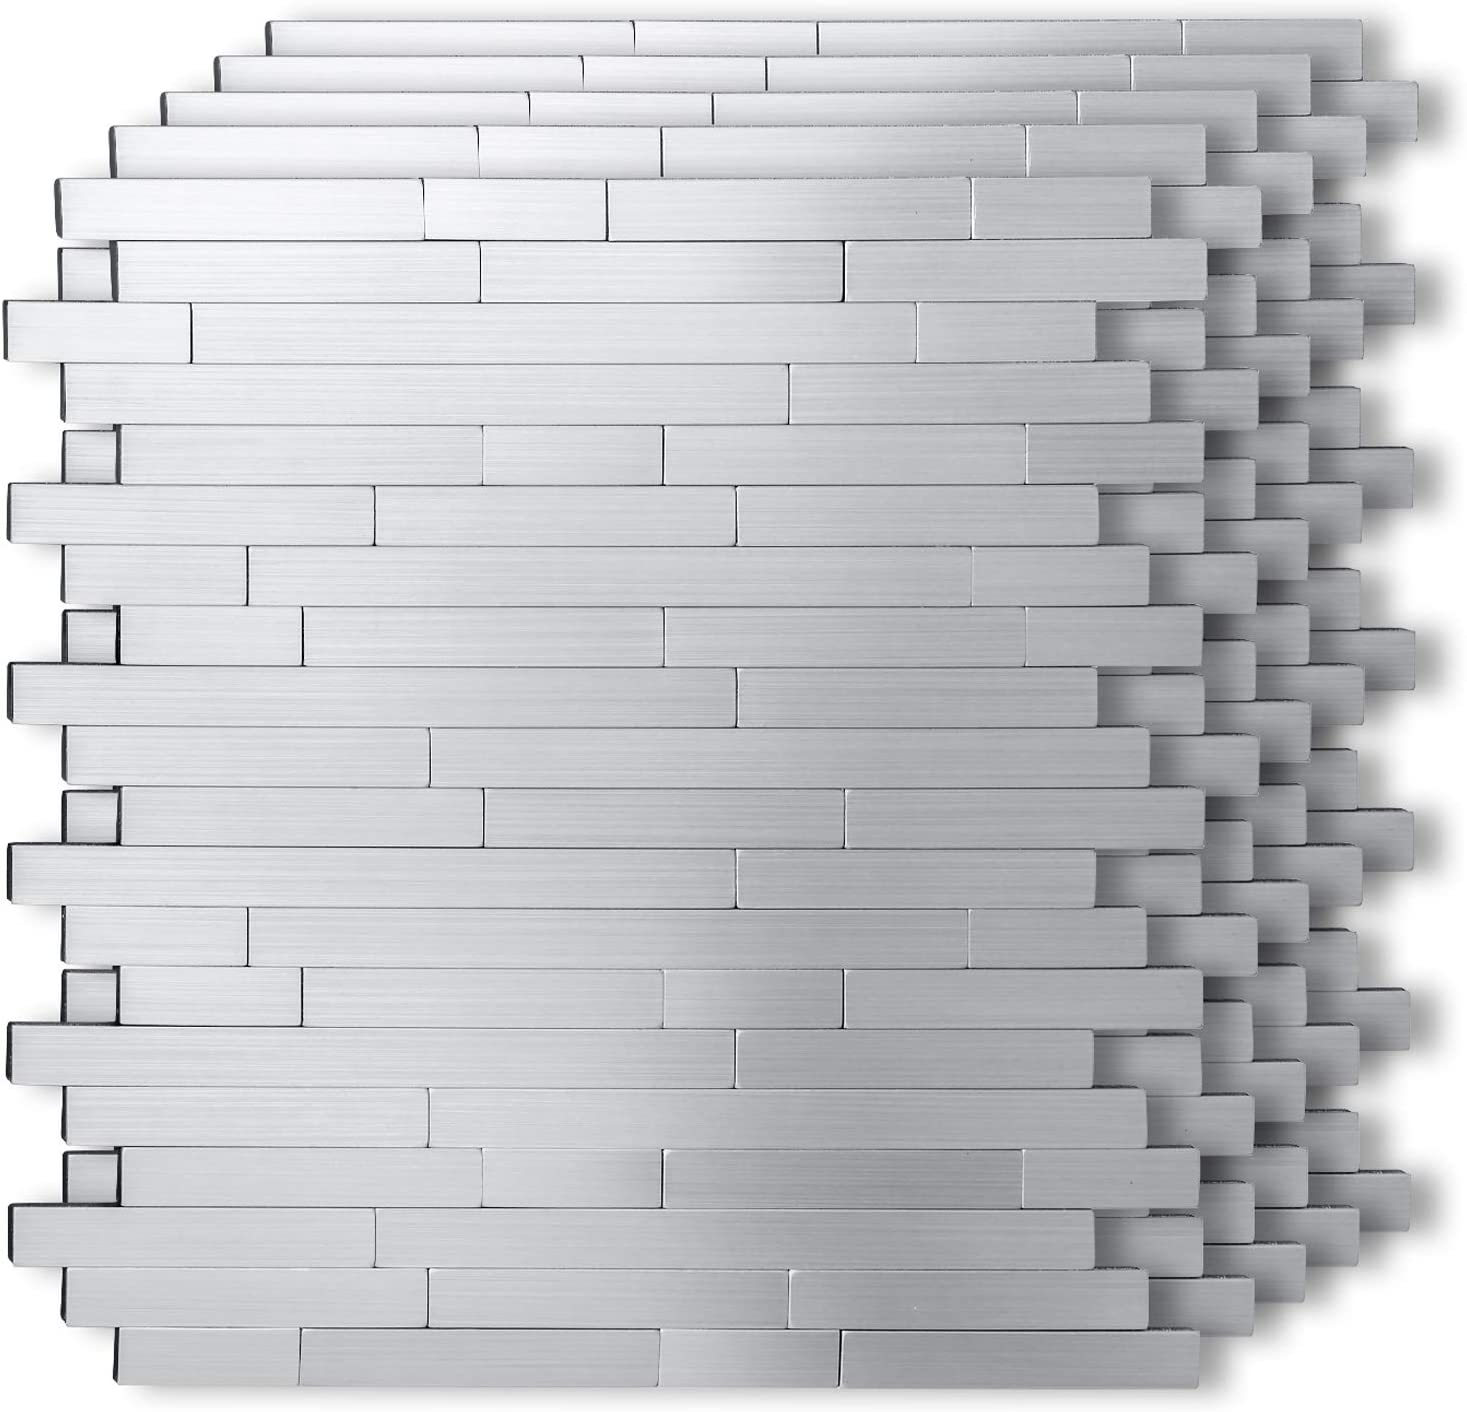 "HomeyMosai Peel and Stick Tile Metal Backsplash Stick on Kitchen Bathroom Stove Walls Decor Aluminum Surface Metal Smart Tiles 3D Wall Sticker,Irregular Subway Stripe Puzzle(12""x12""x 5 Sheets)"